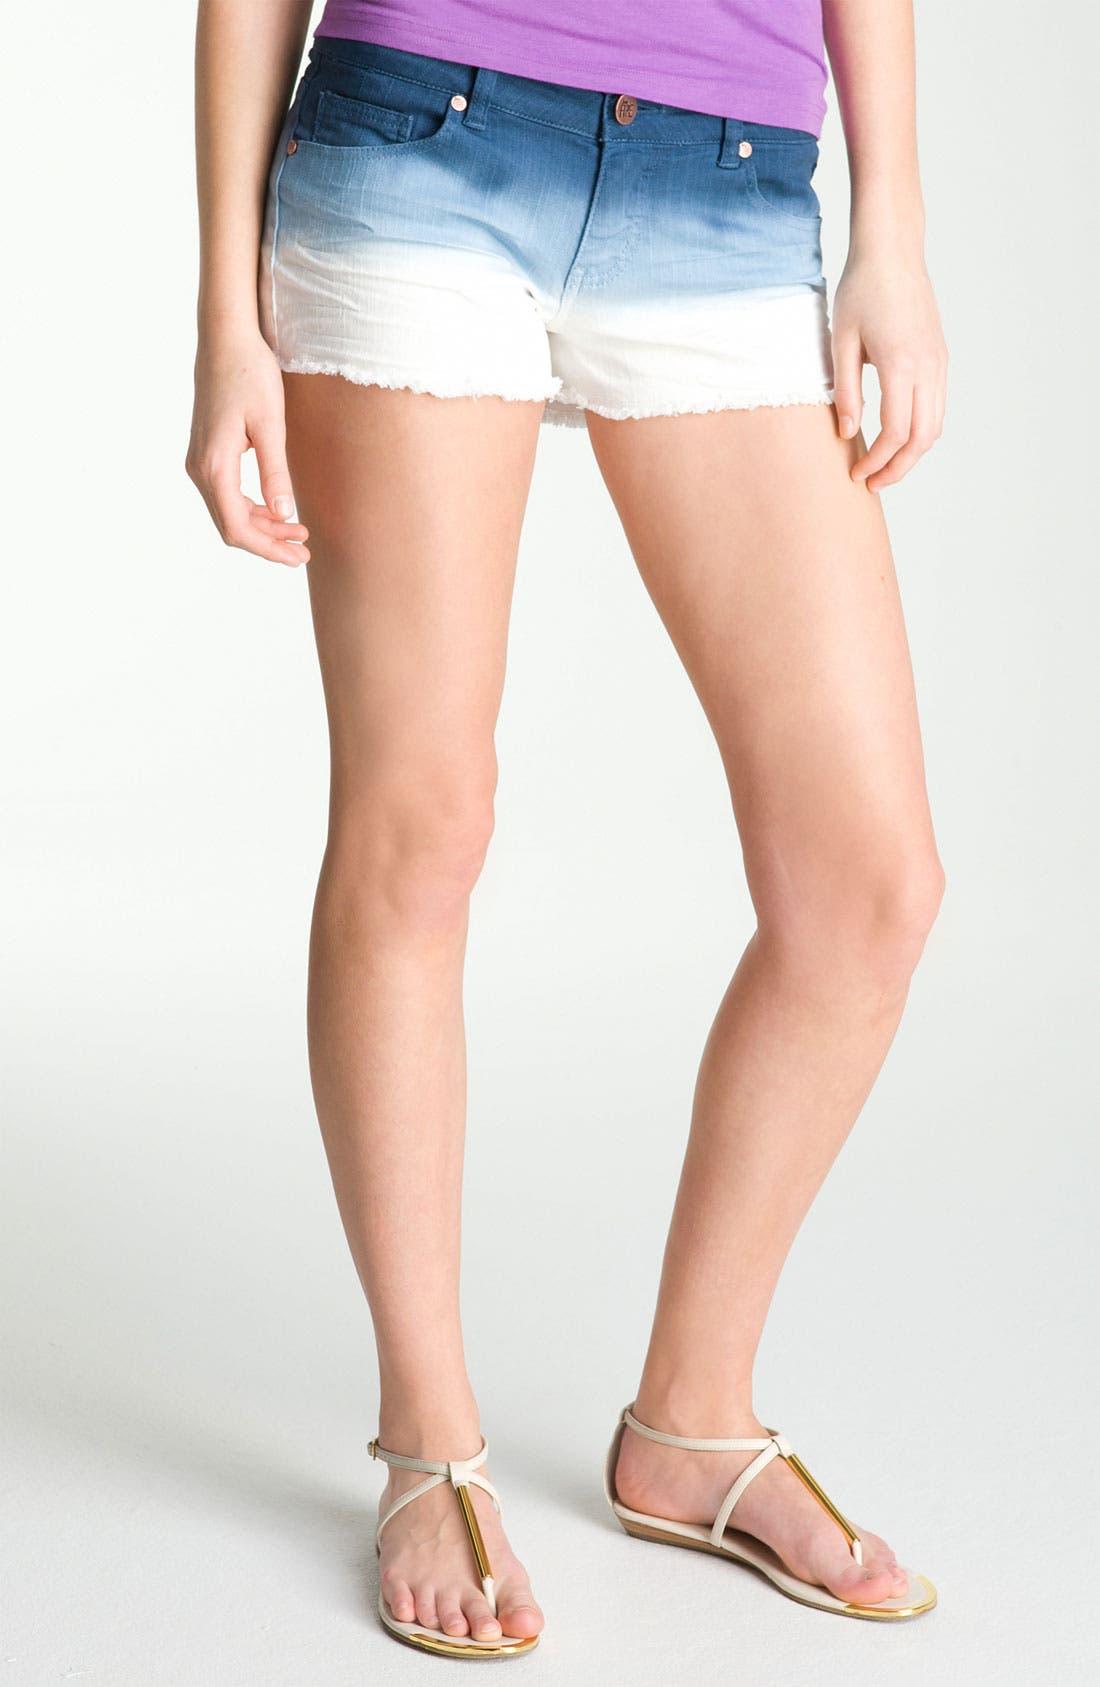 Alternate Image 1 Selected - Fire Dip Dyed Cutoff Denim Shorts (Juniors)